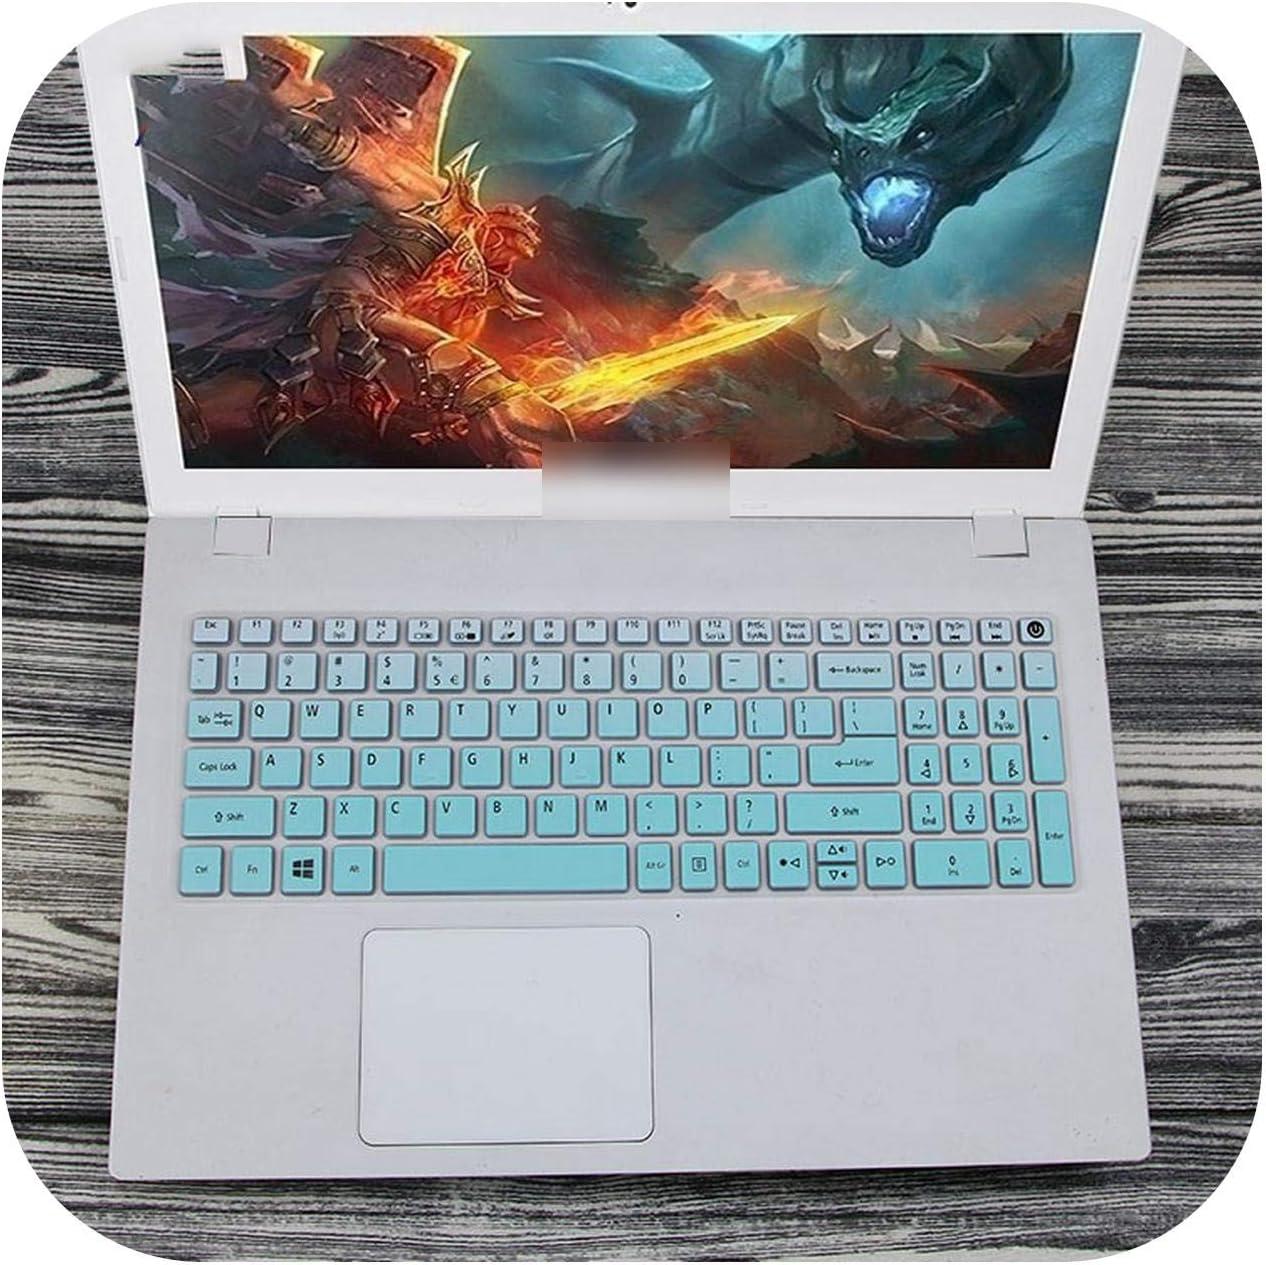 15.6 inch Keyboard Silicone Keyboard Cover Protector for Acer Aspire e15 E5 573G 532 522 V3 574 F5 572G VN7 592G T5000 TMP258-fademint-